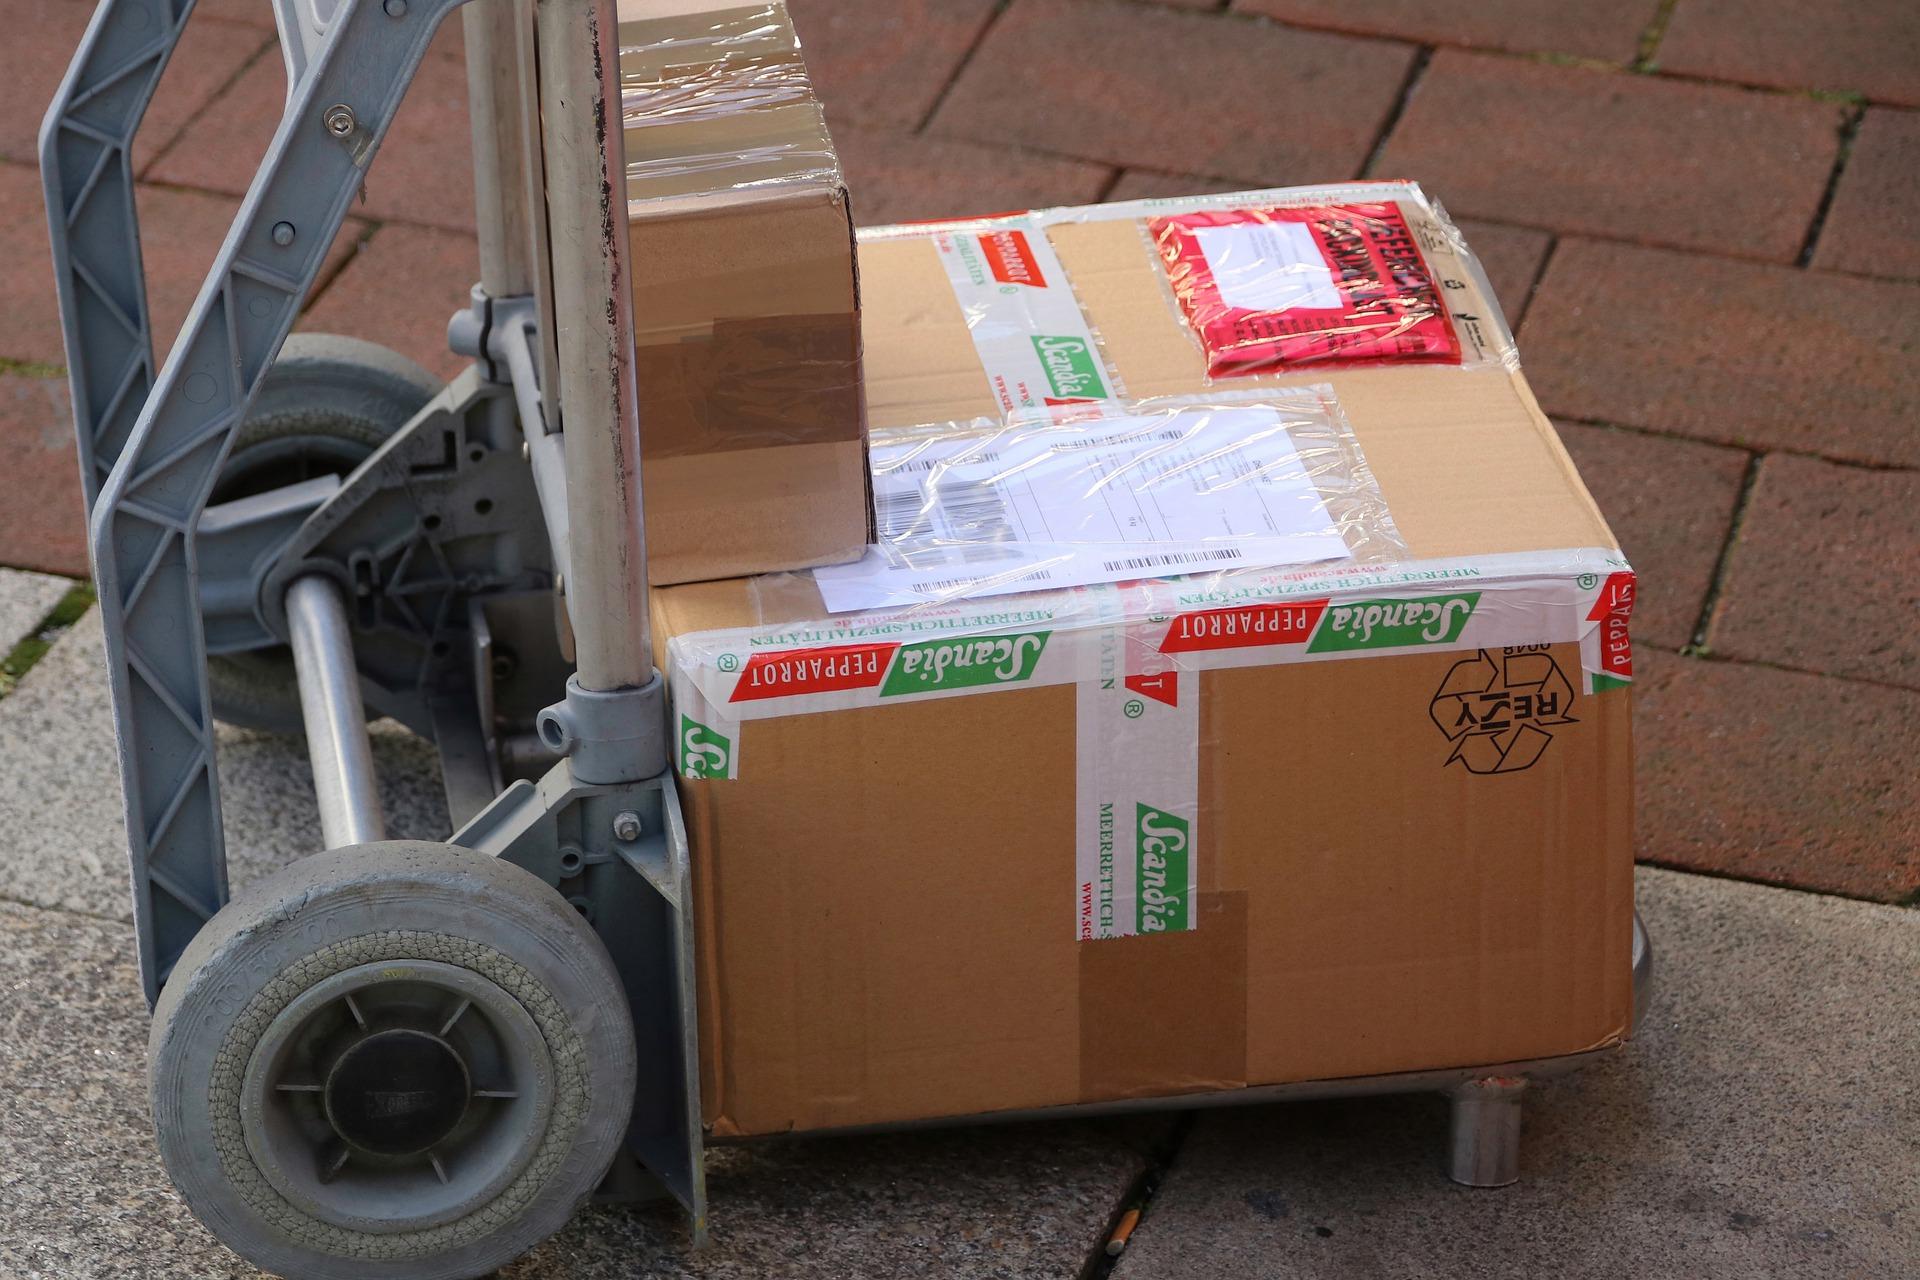 Tu e-commerce y el courier